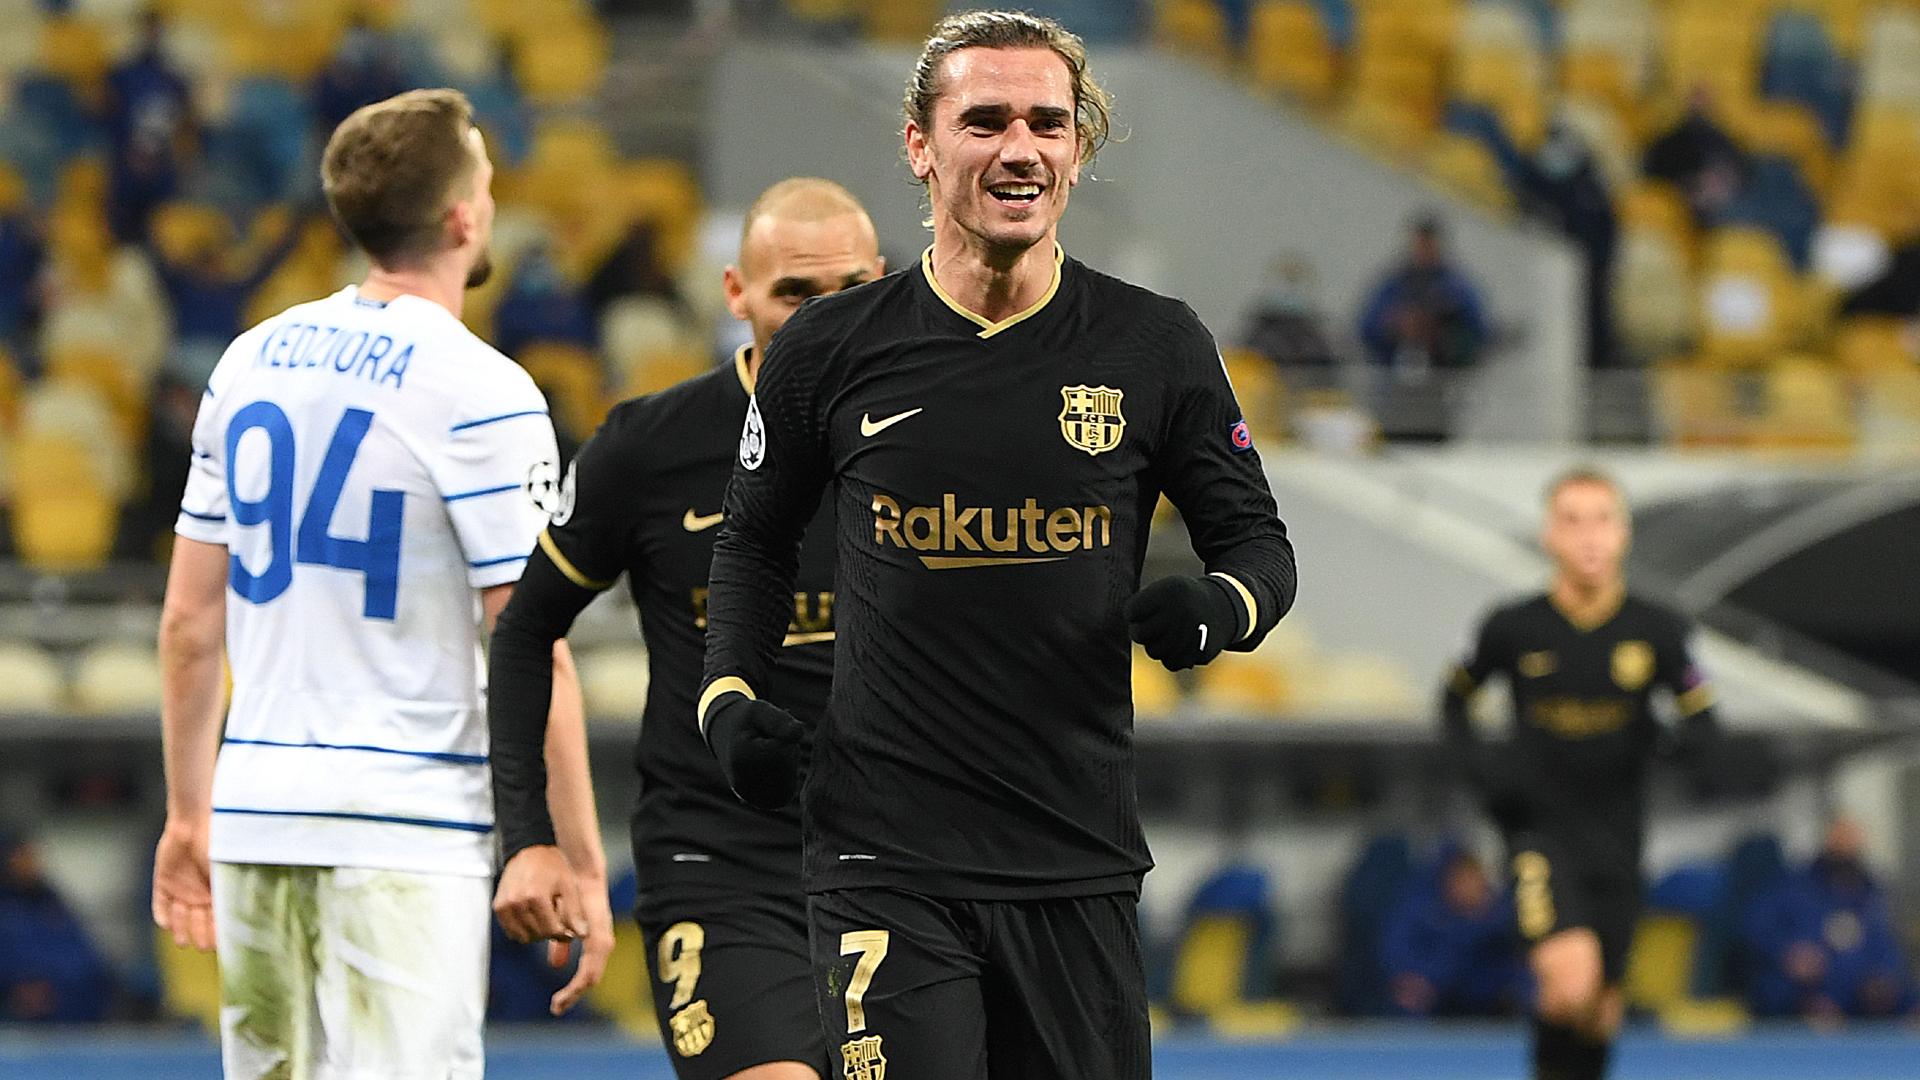 Koeman claims nothing behind 'happy' Griezmann not starting in Kiev